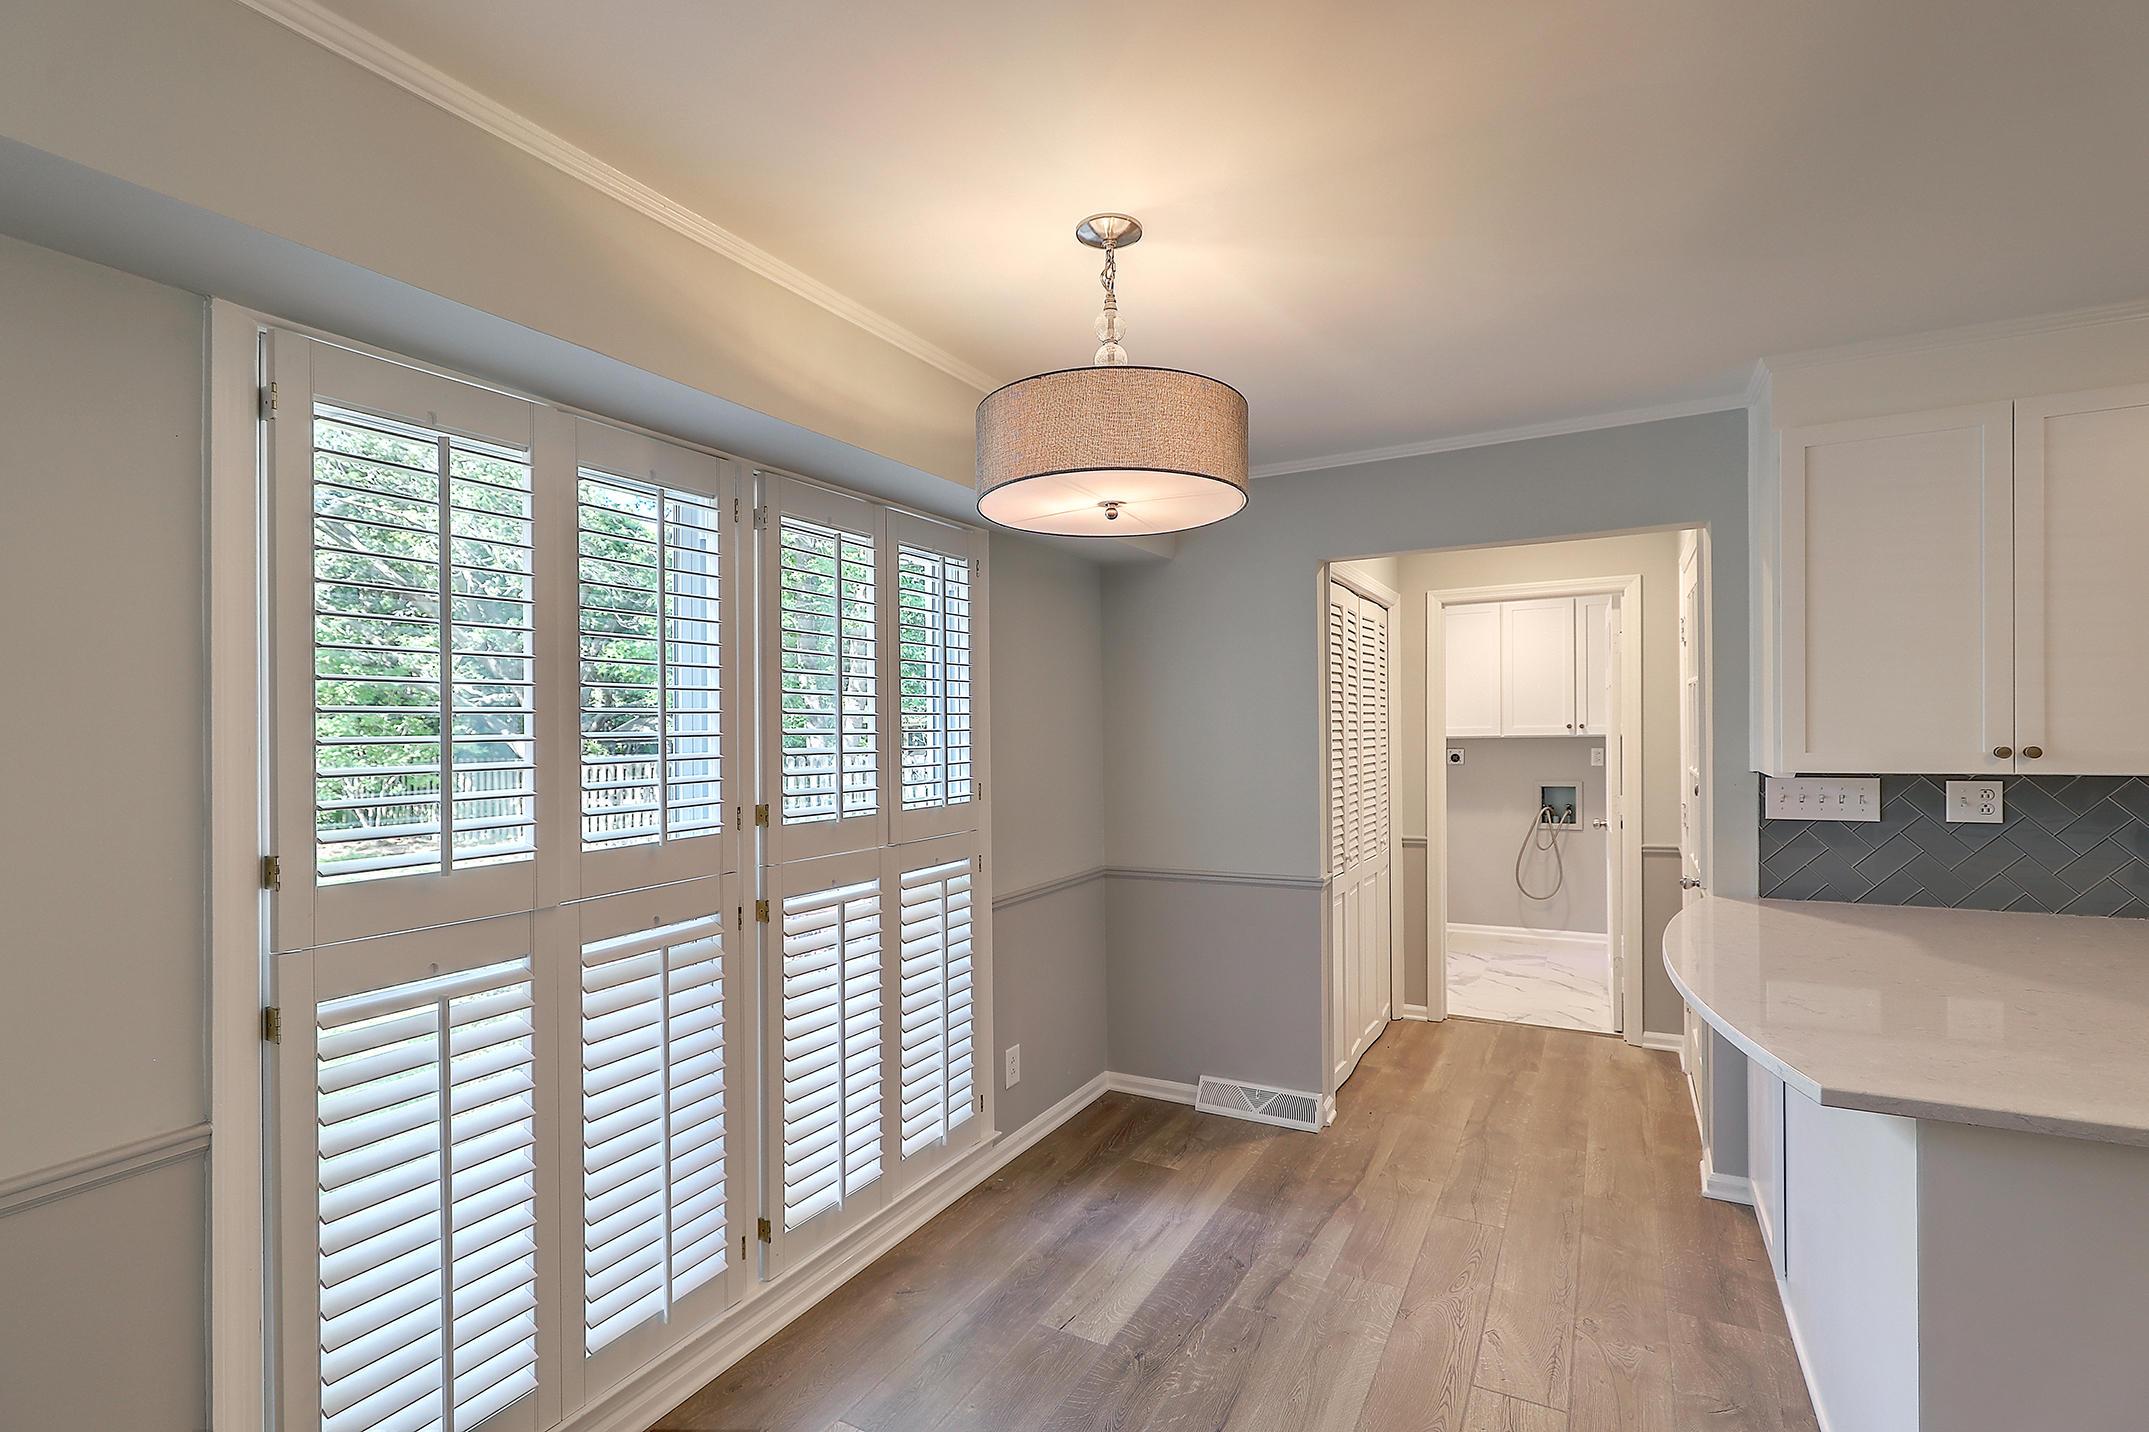 Wespanee Place Homes For Sale - 4 Ashland, Charleston, SC - 28